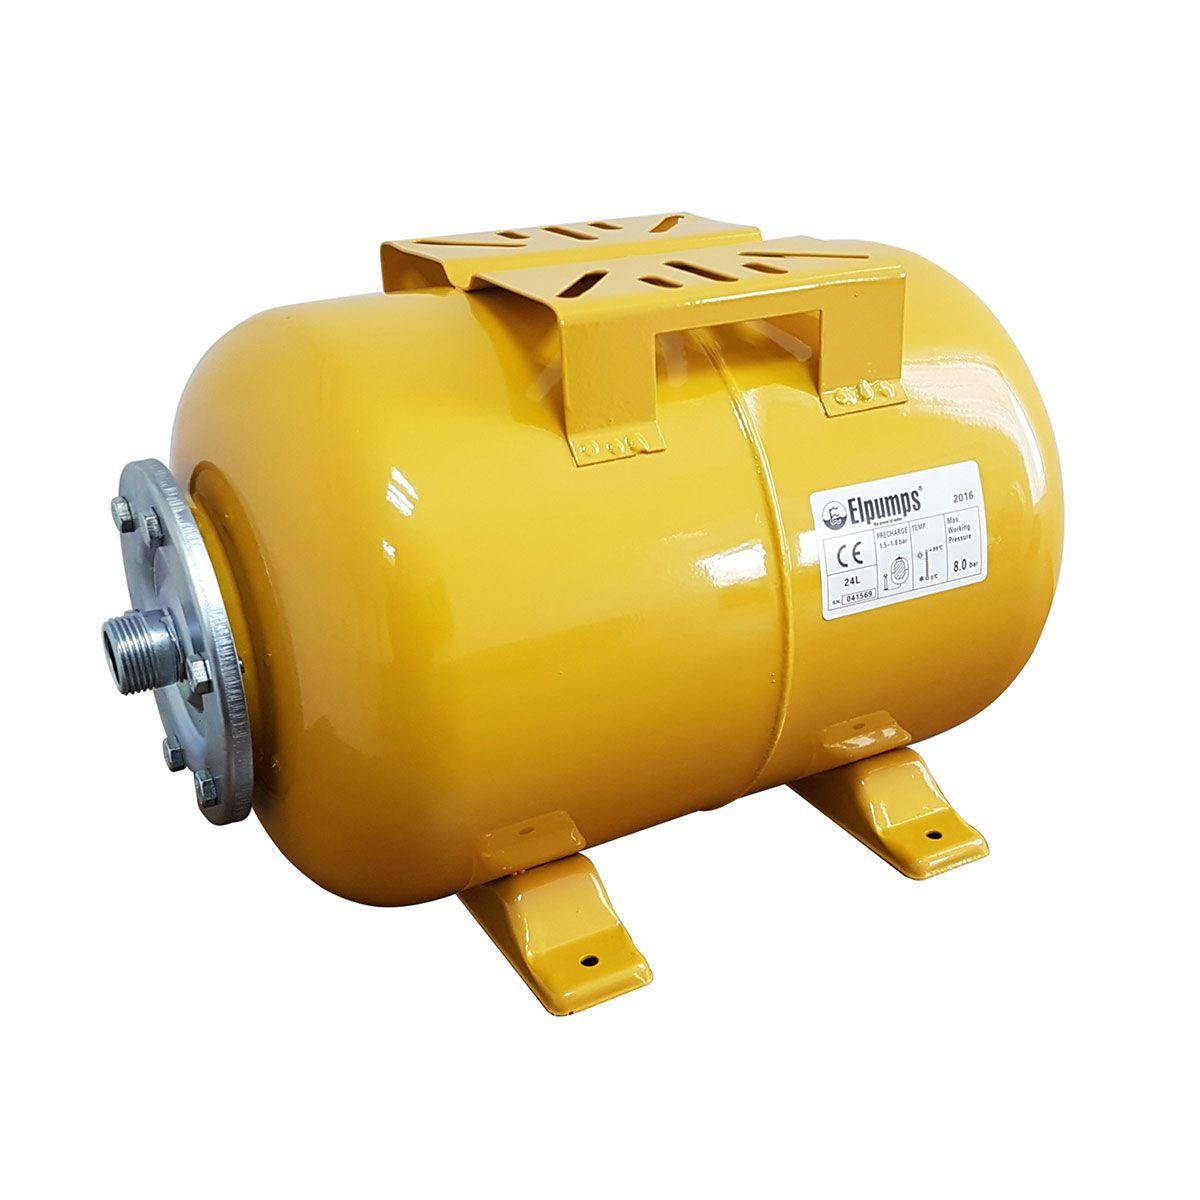 Expansionsgefäss, Stahlblech lackiert, gelb, 25 l, 1' AG